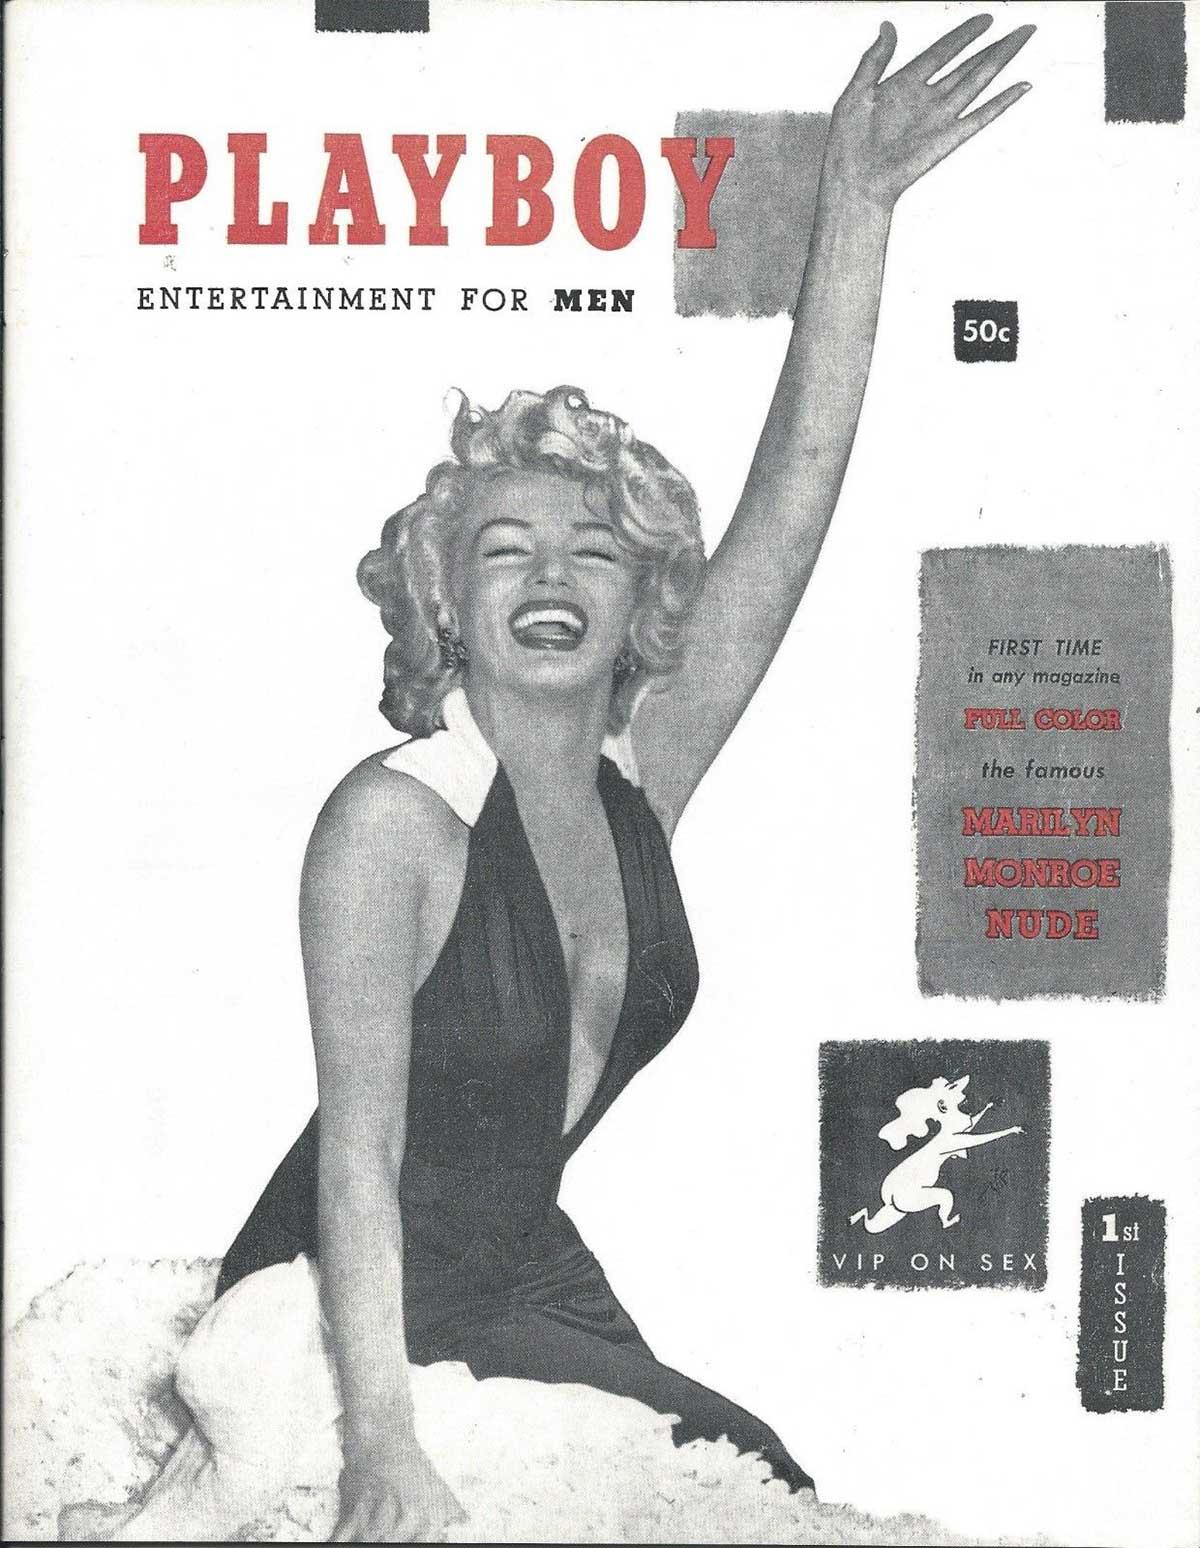 PLAYBOY 1953 год